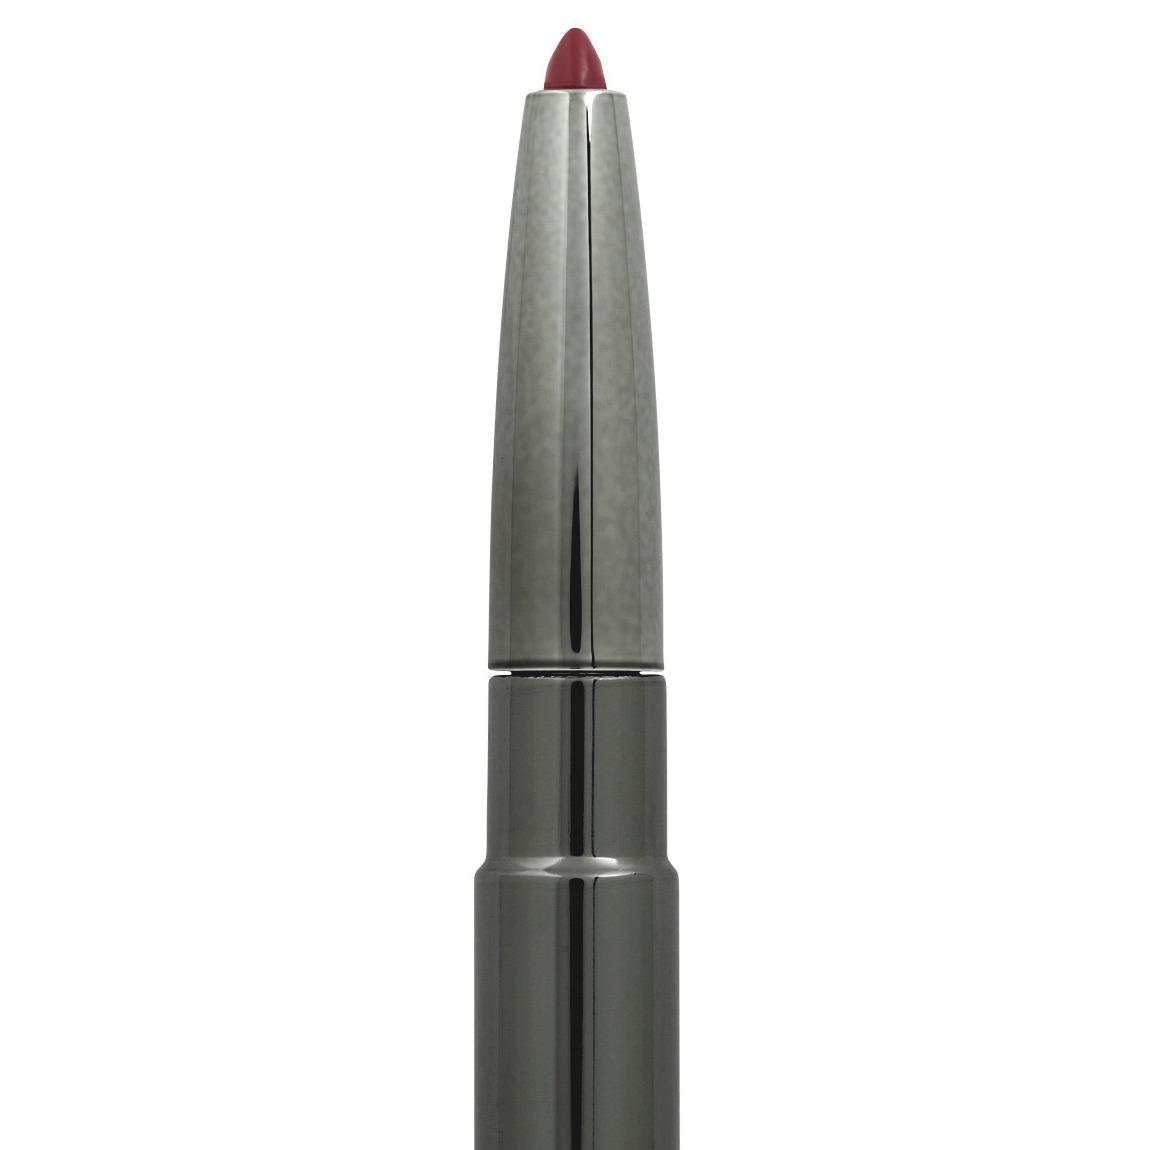 Inglot Cosmetics Full Metal Lipliner 857 alternative view 1.